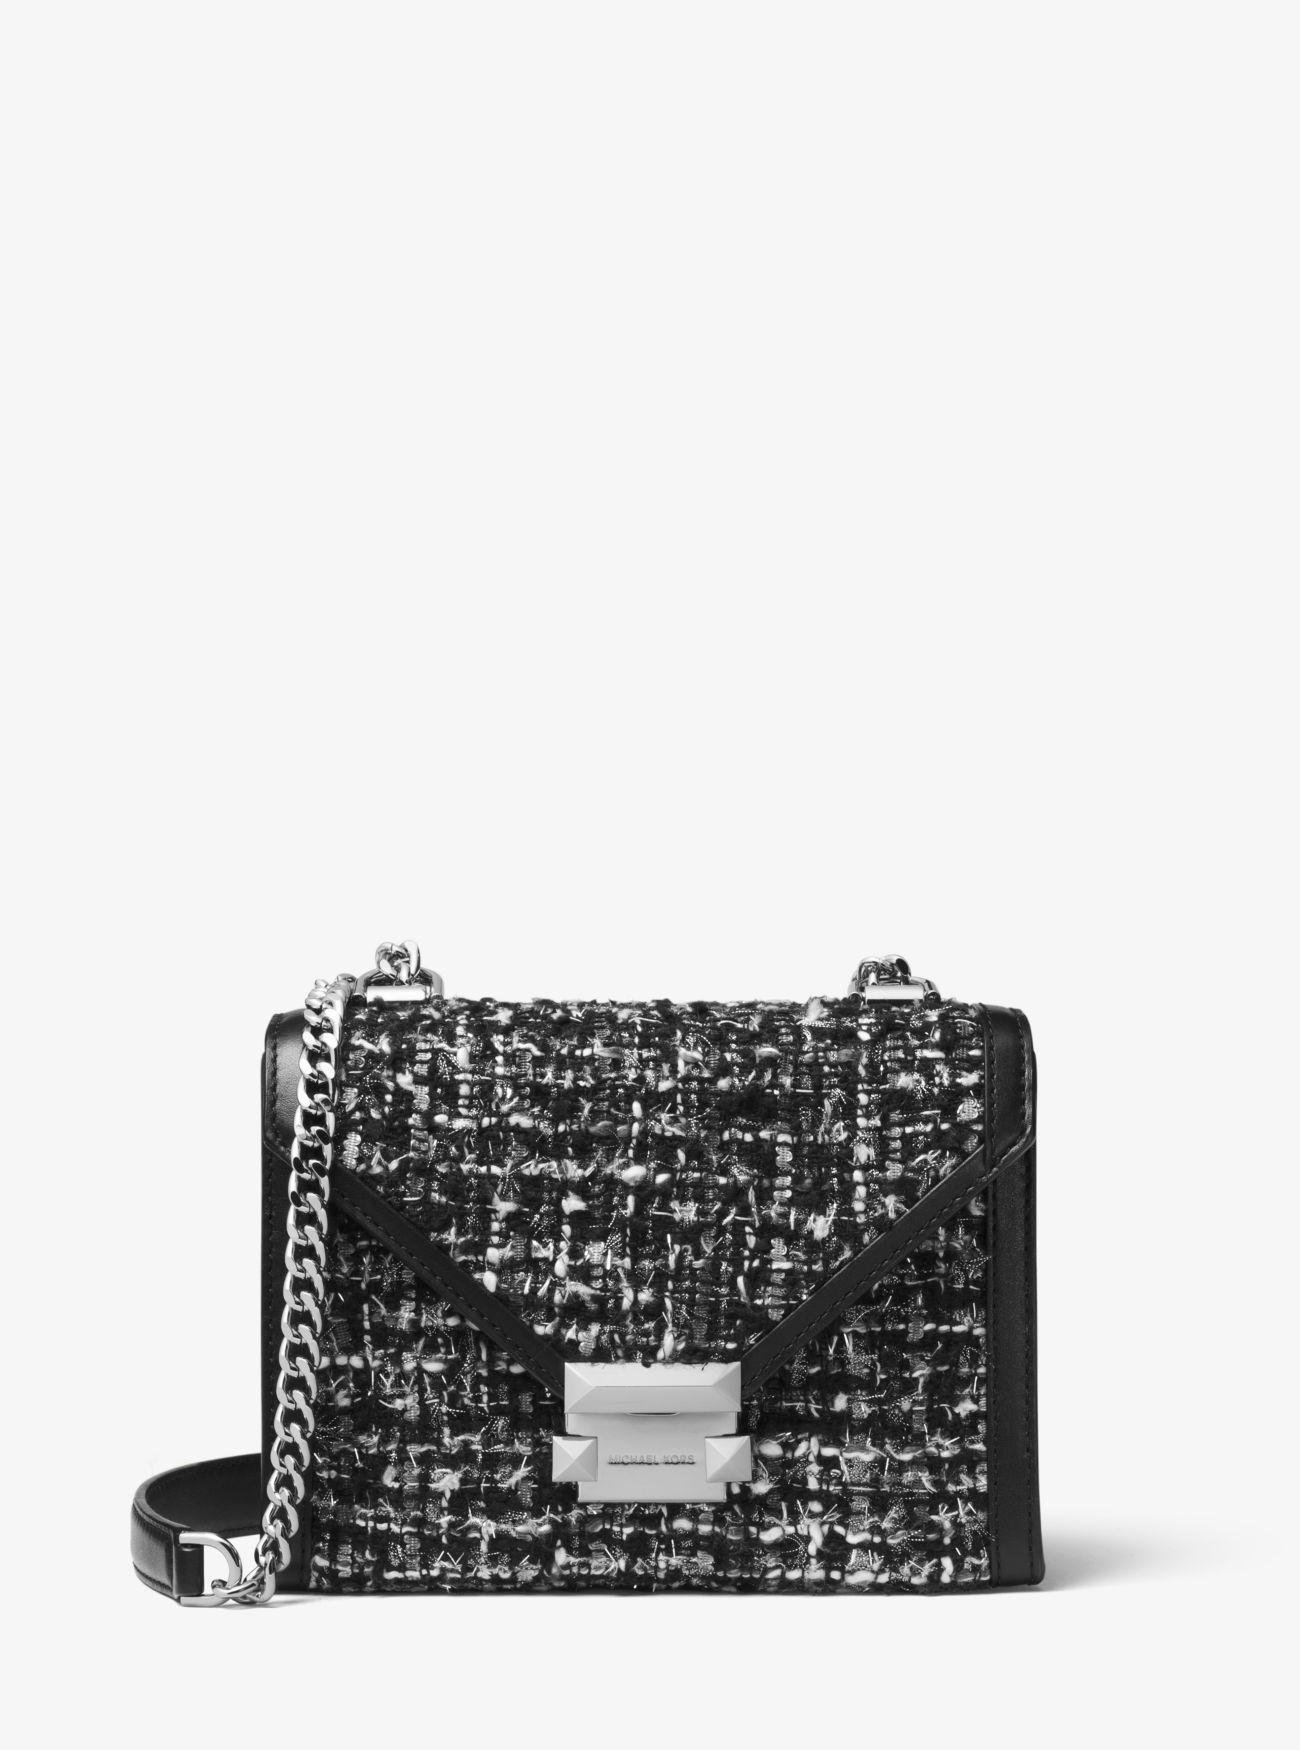 e008f3416d38 Whitney Small Tweed Convertible Shoulder Bag | Farfetch.com ...